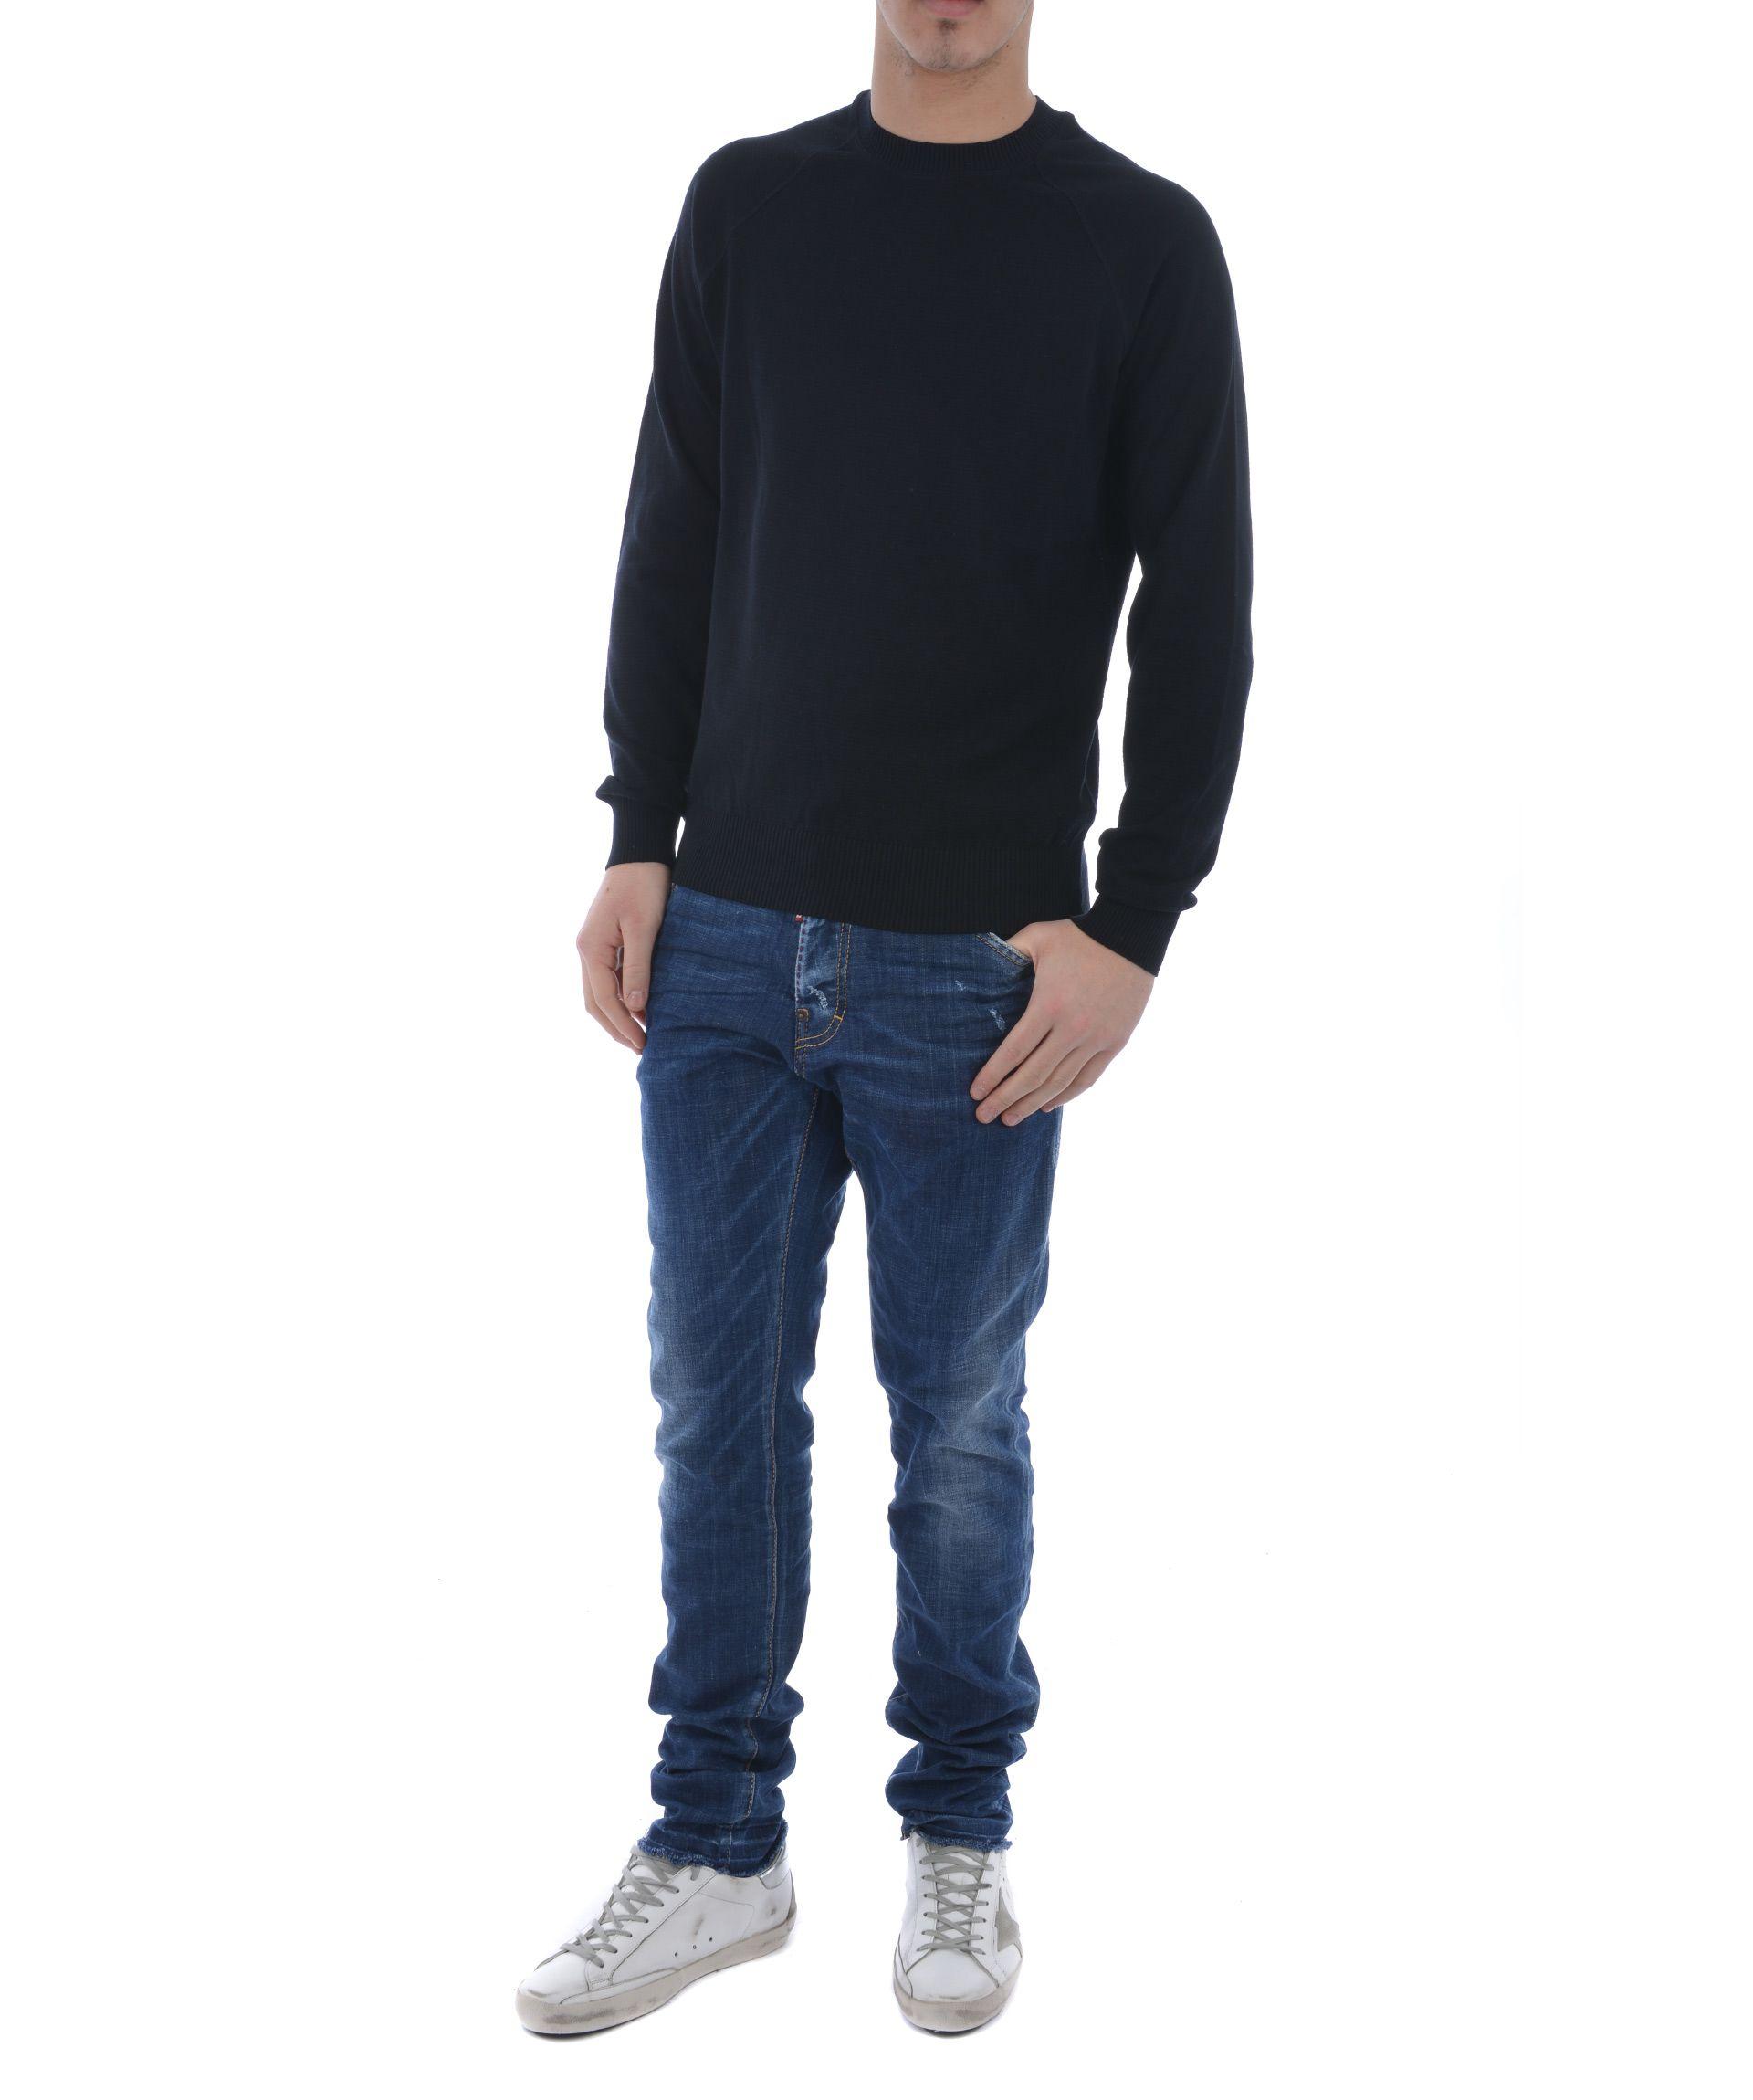 Ami Alexandre Mattiussi Classic Sweatshirt